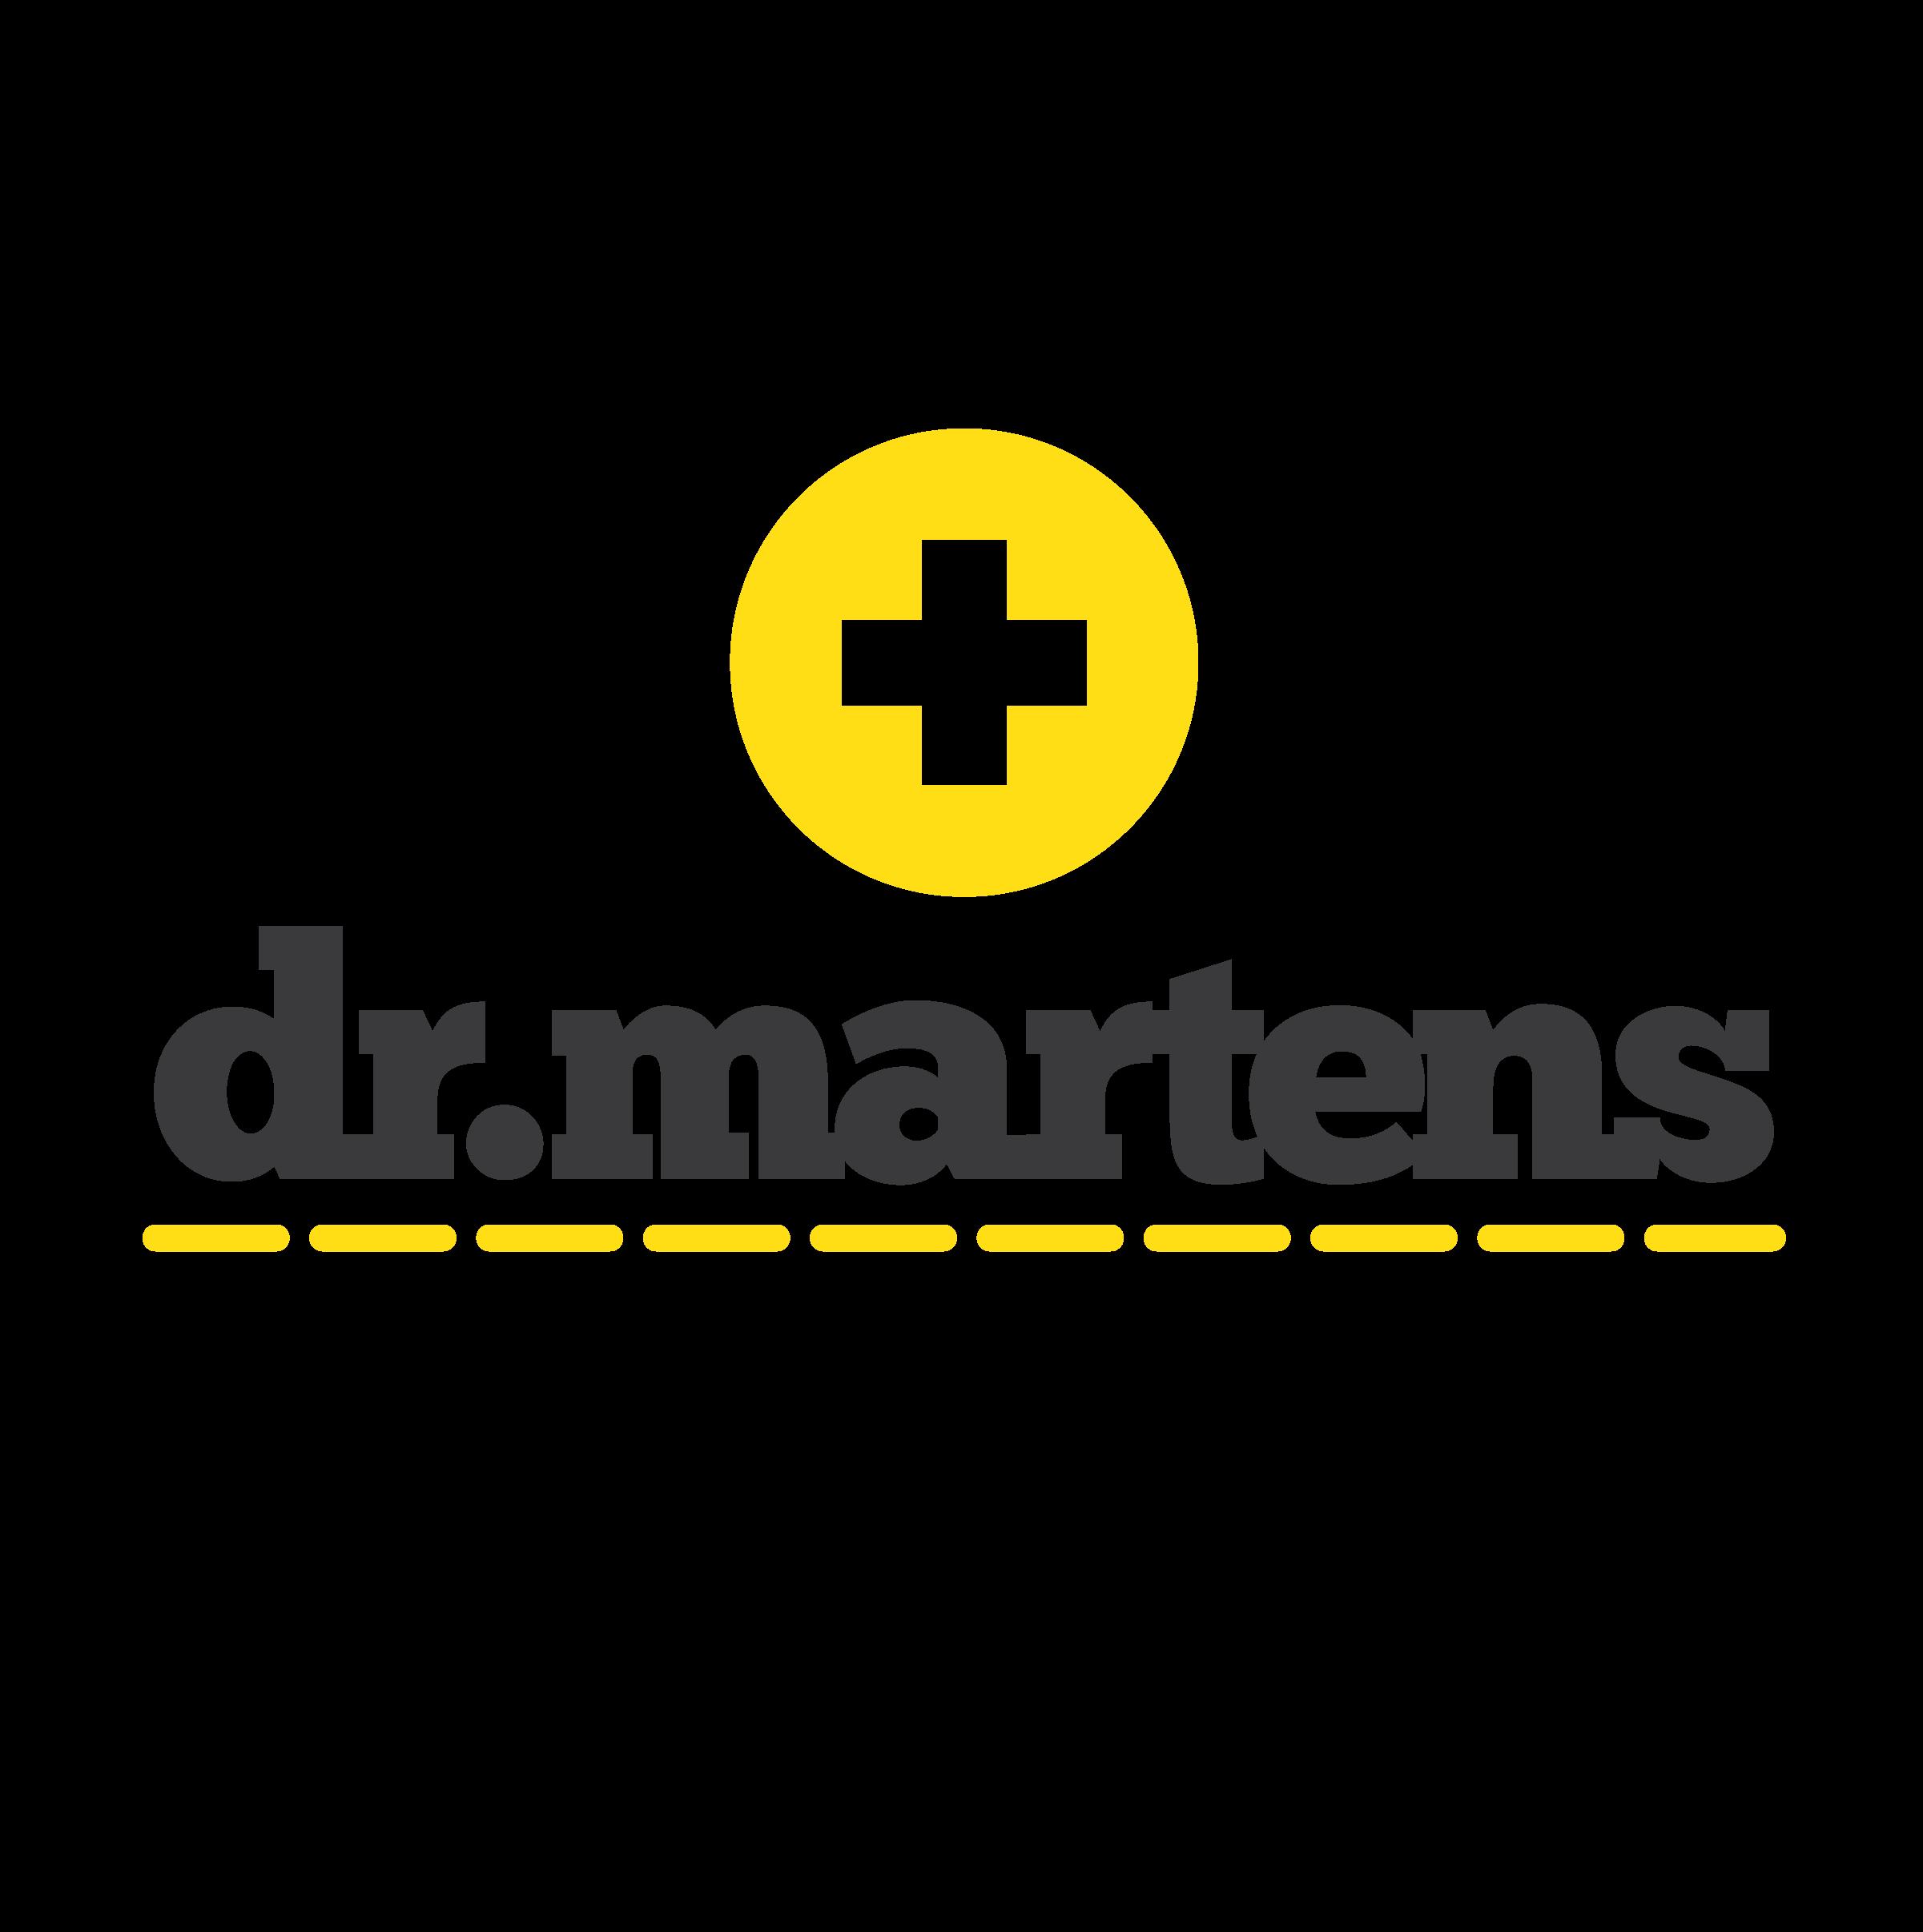 dr martens similar brand